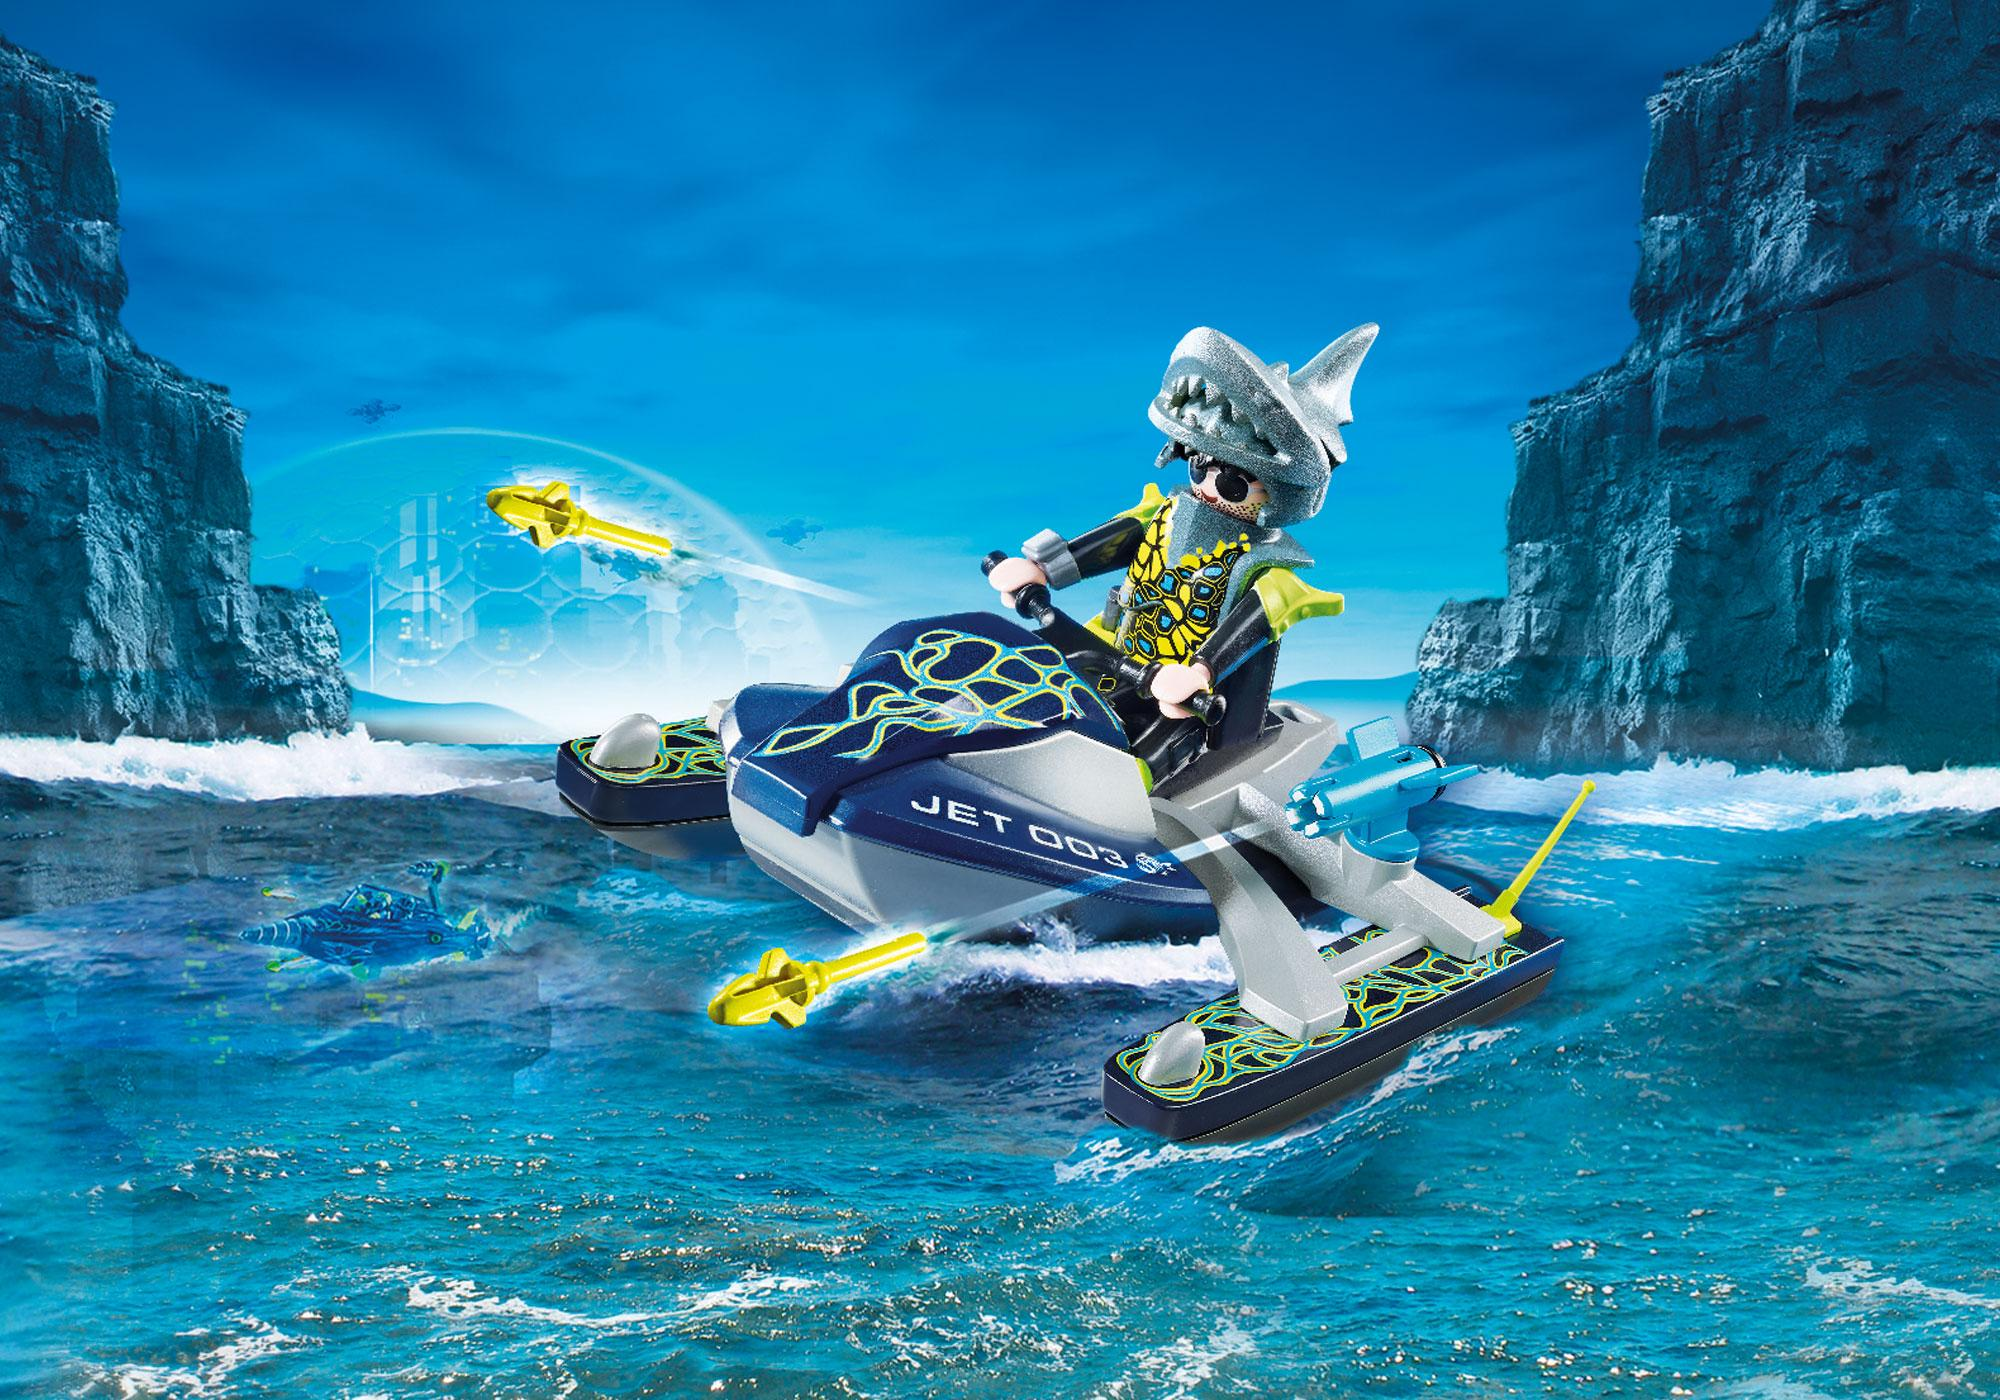 http://media.playmobil.com/i/playmobil/70007_product_detail/TEAM S.H.A.R.K. Rocket Rafter